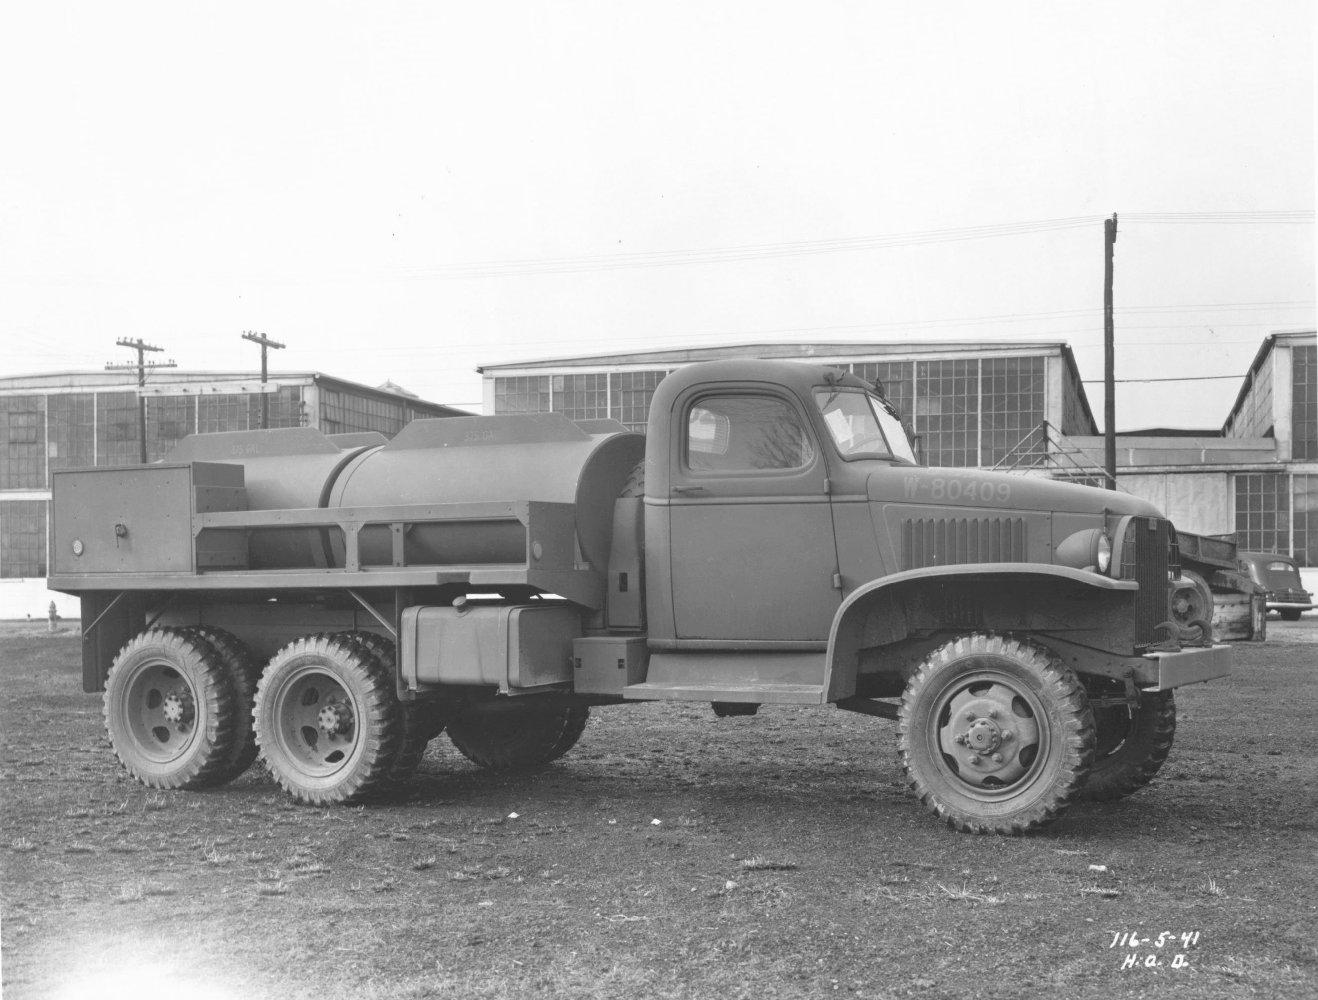 File:GMC CCKW 750 Gal Tanker.jpg - Wikimedia Commons